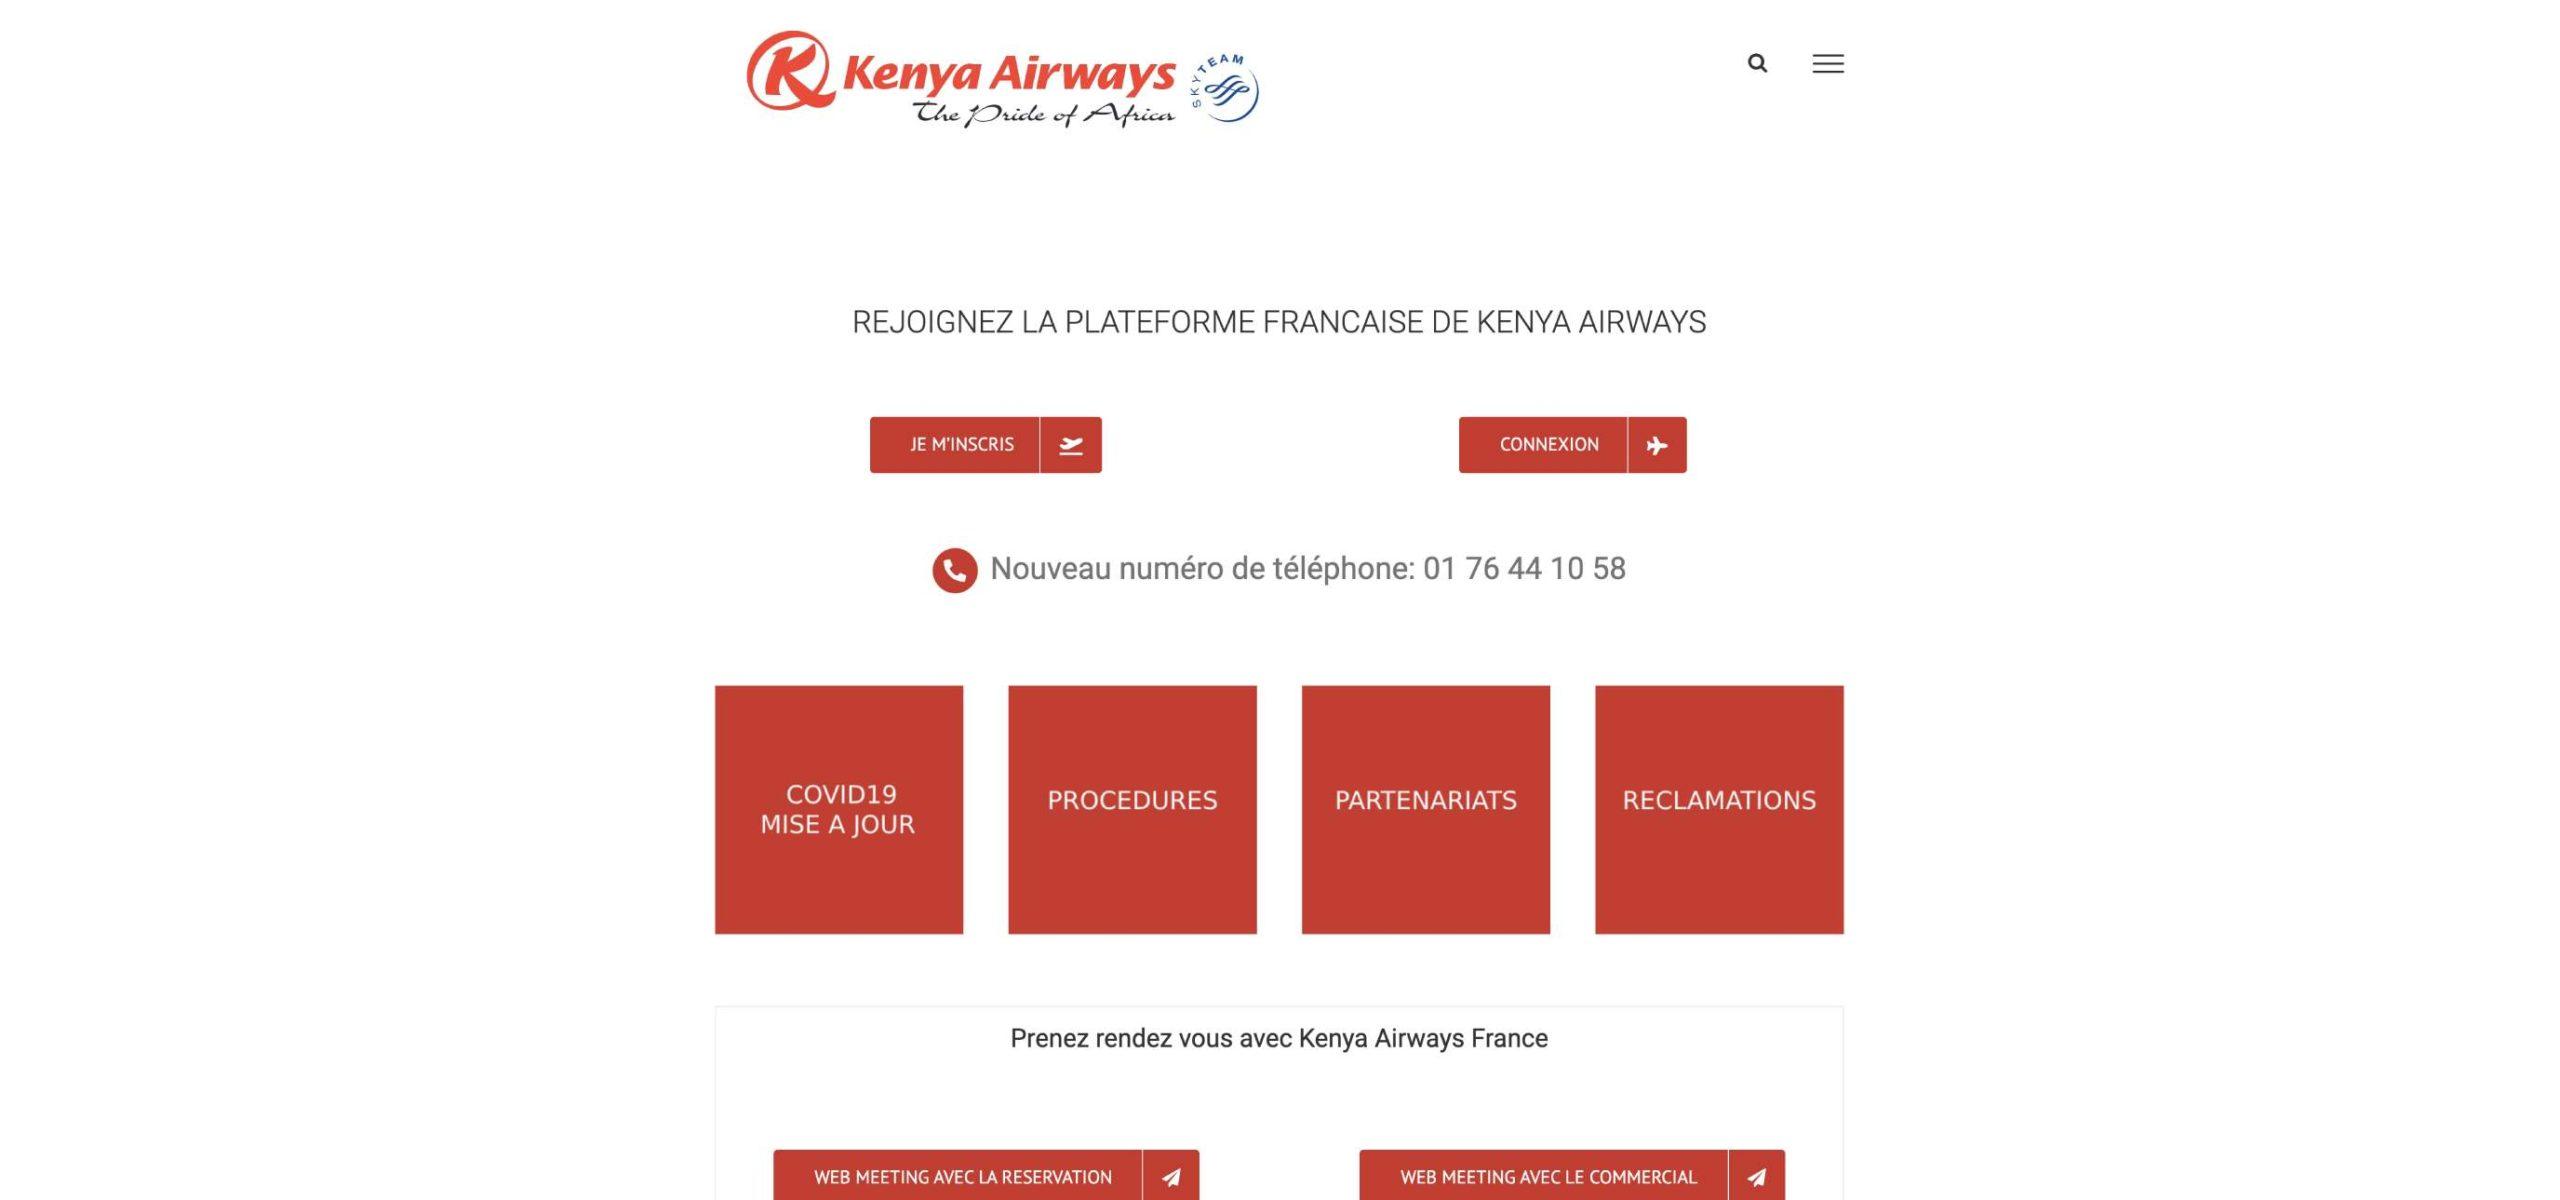 kenya-airways-web-zone-digital-zone